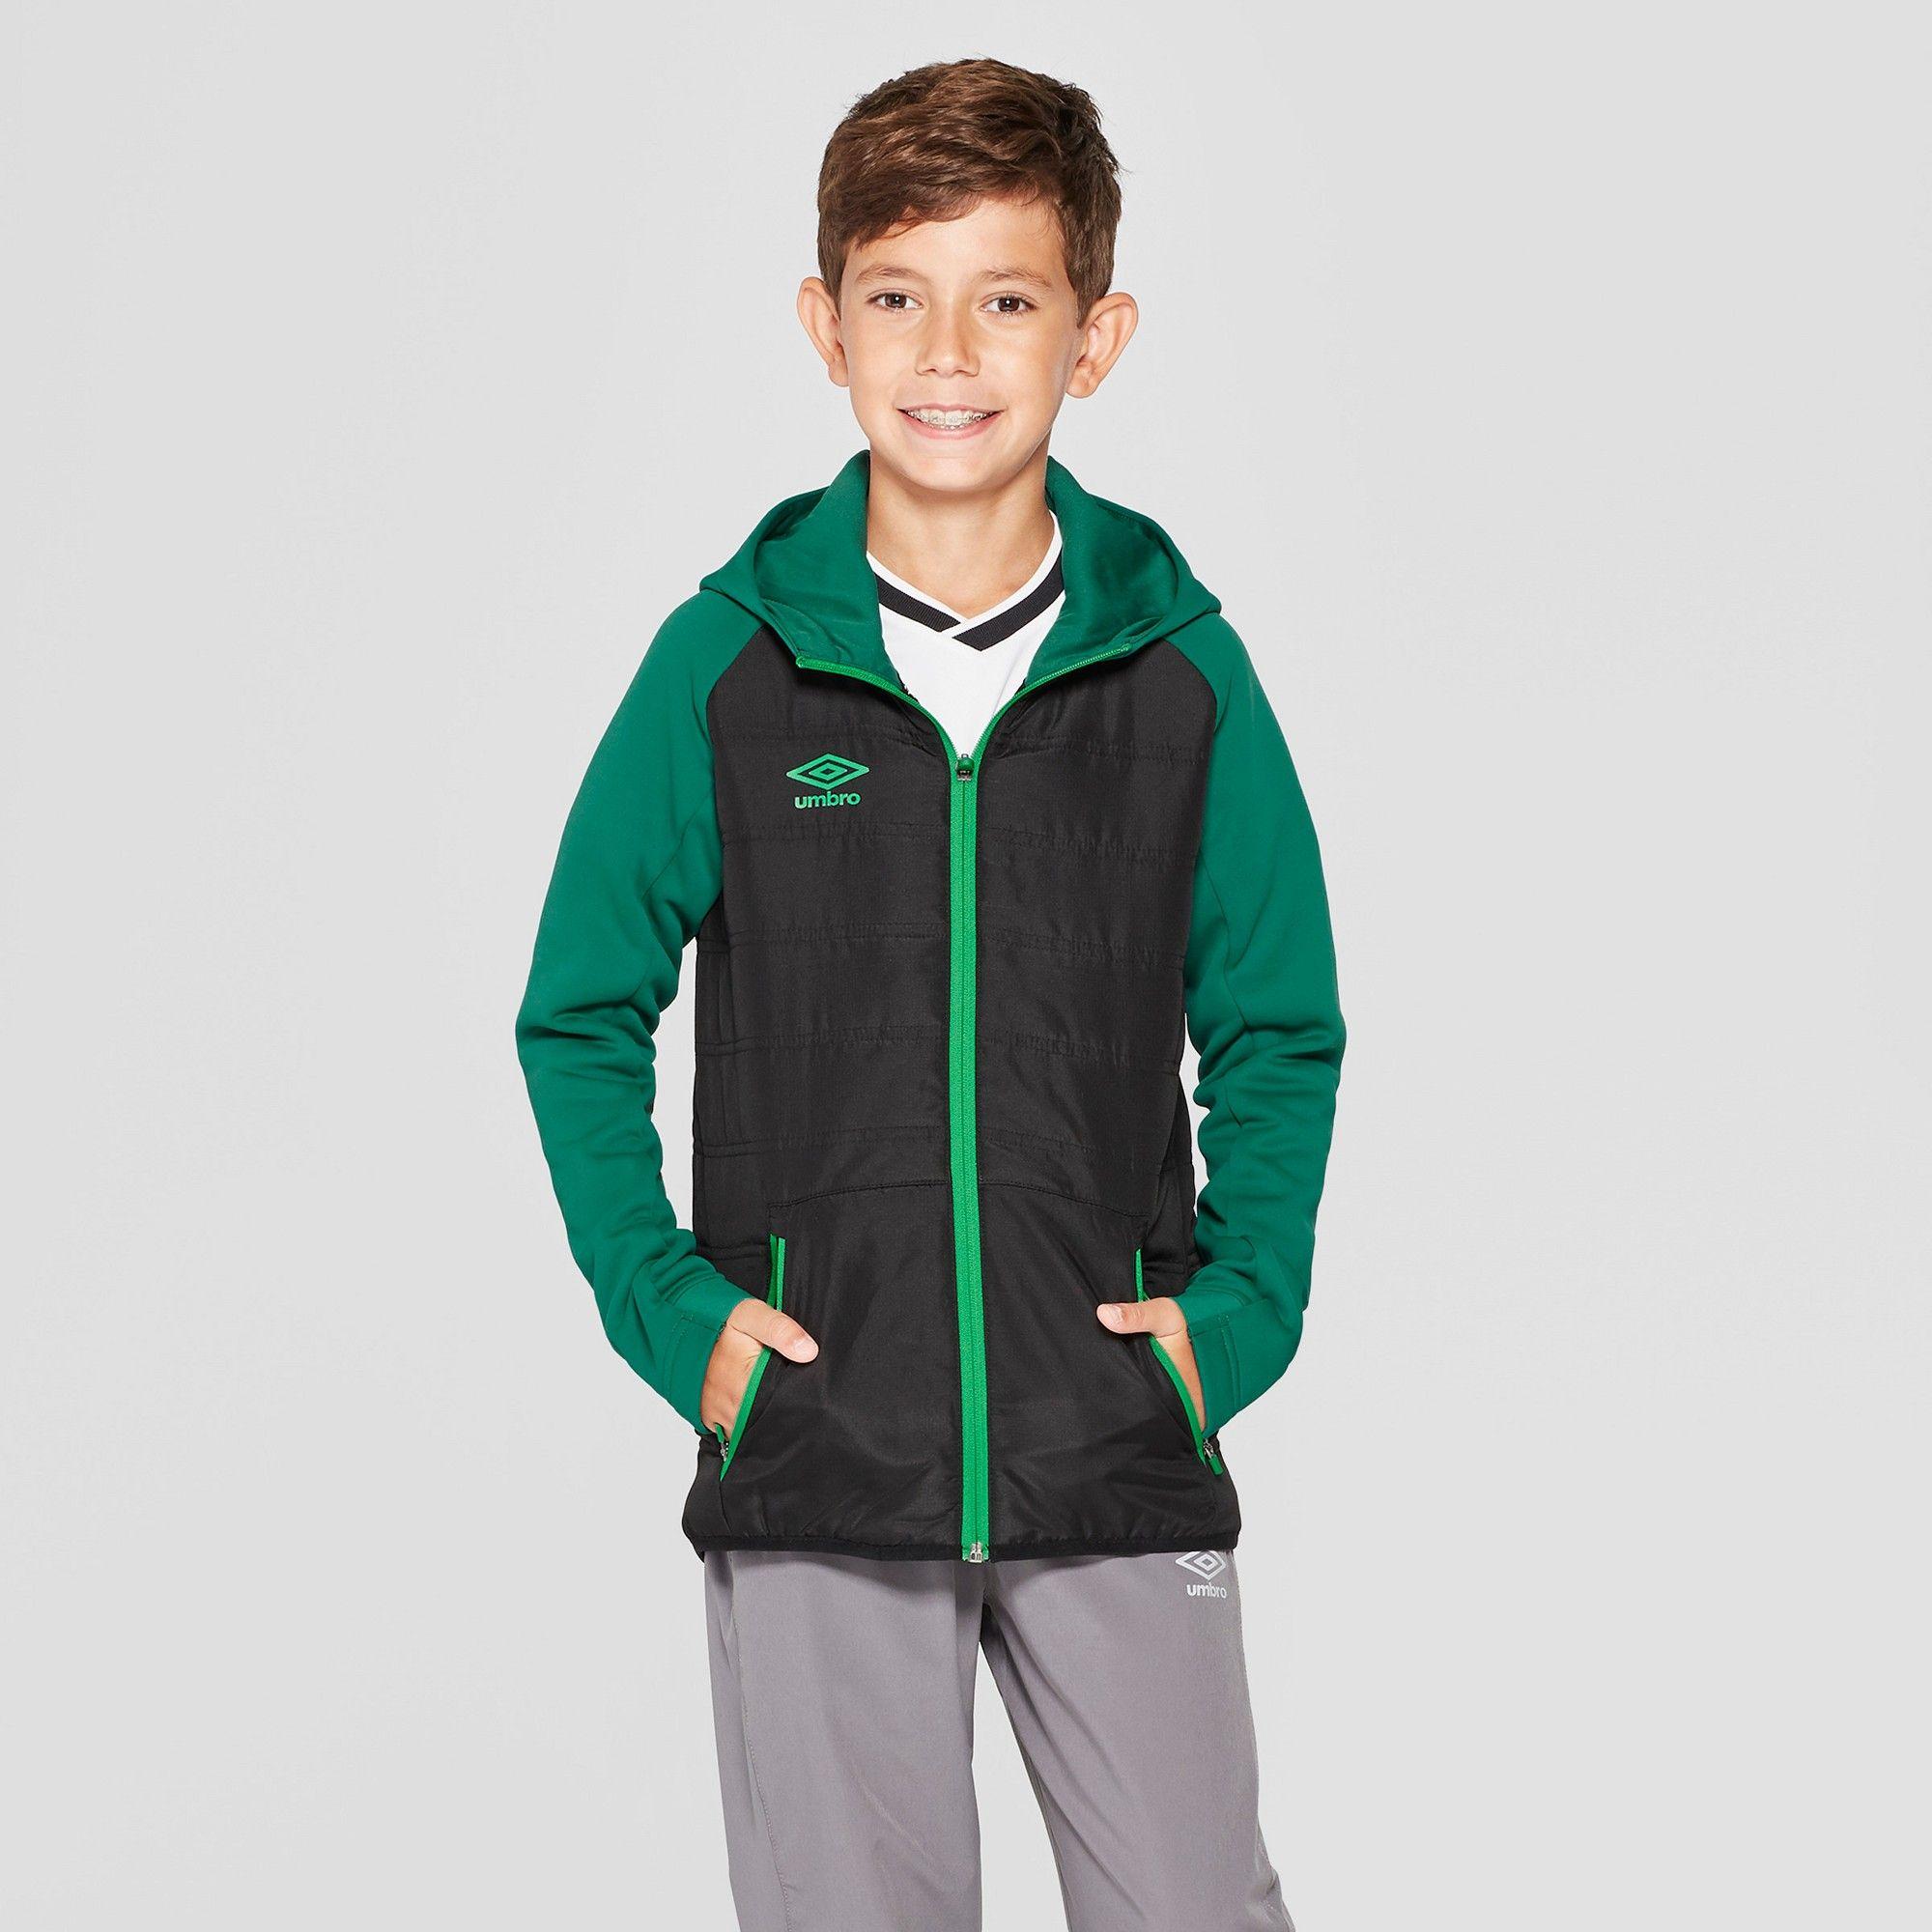 Umbro Boys' Insulated Full Zip Fleece Jacket Black XL